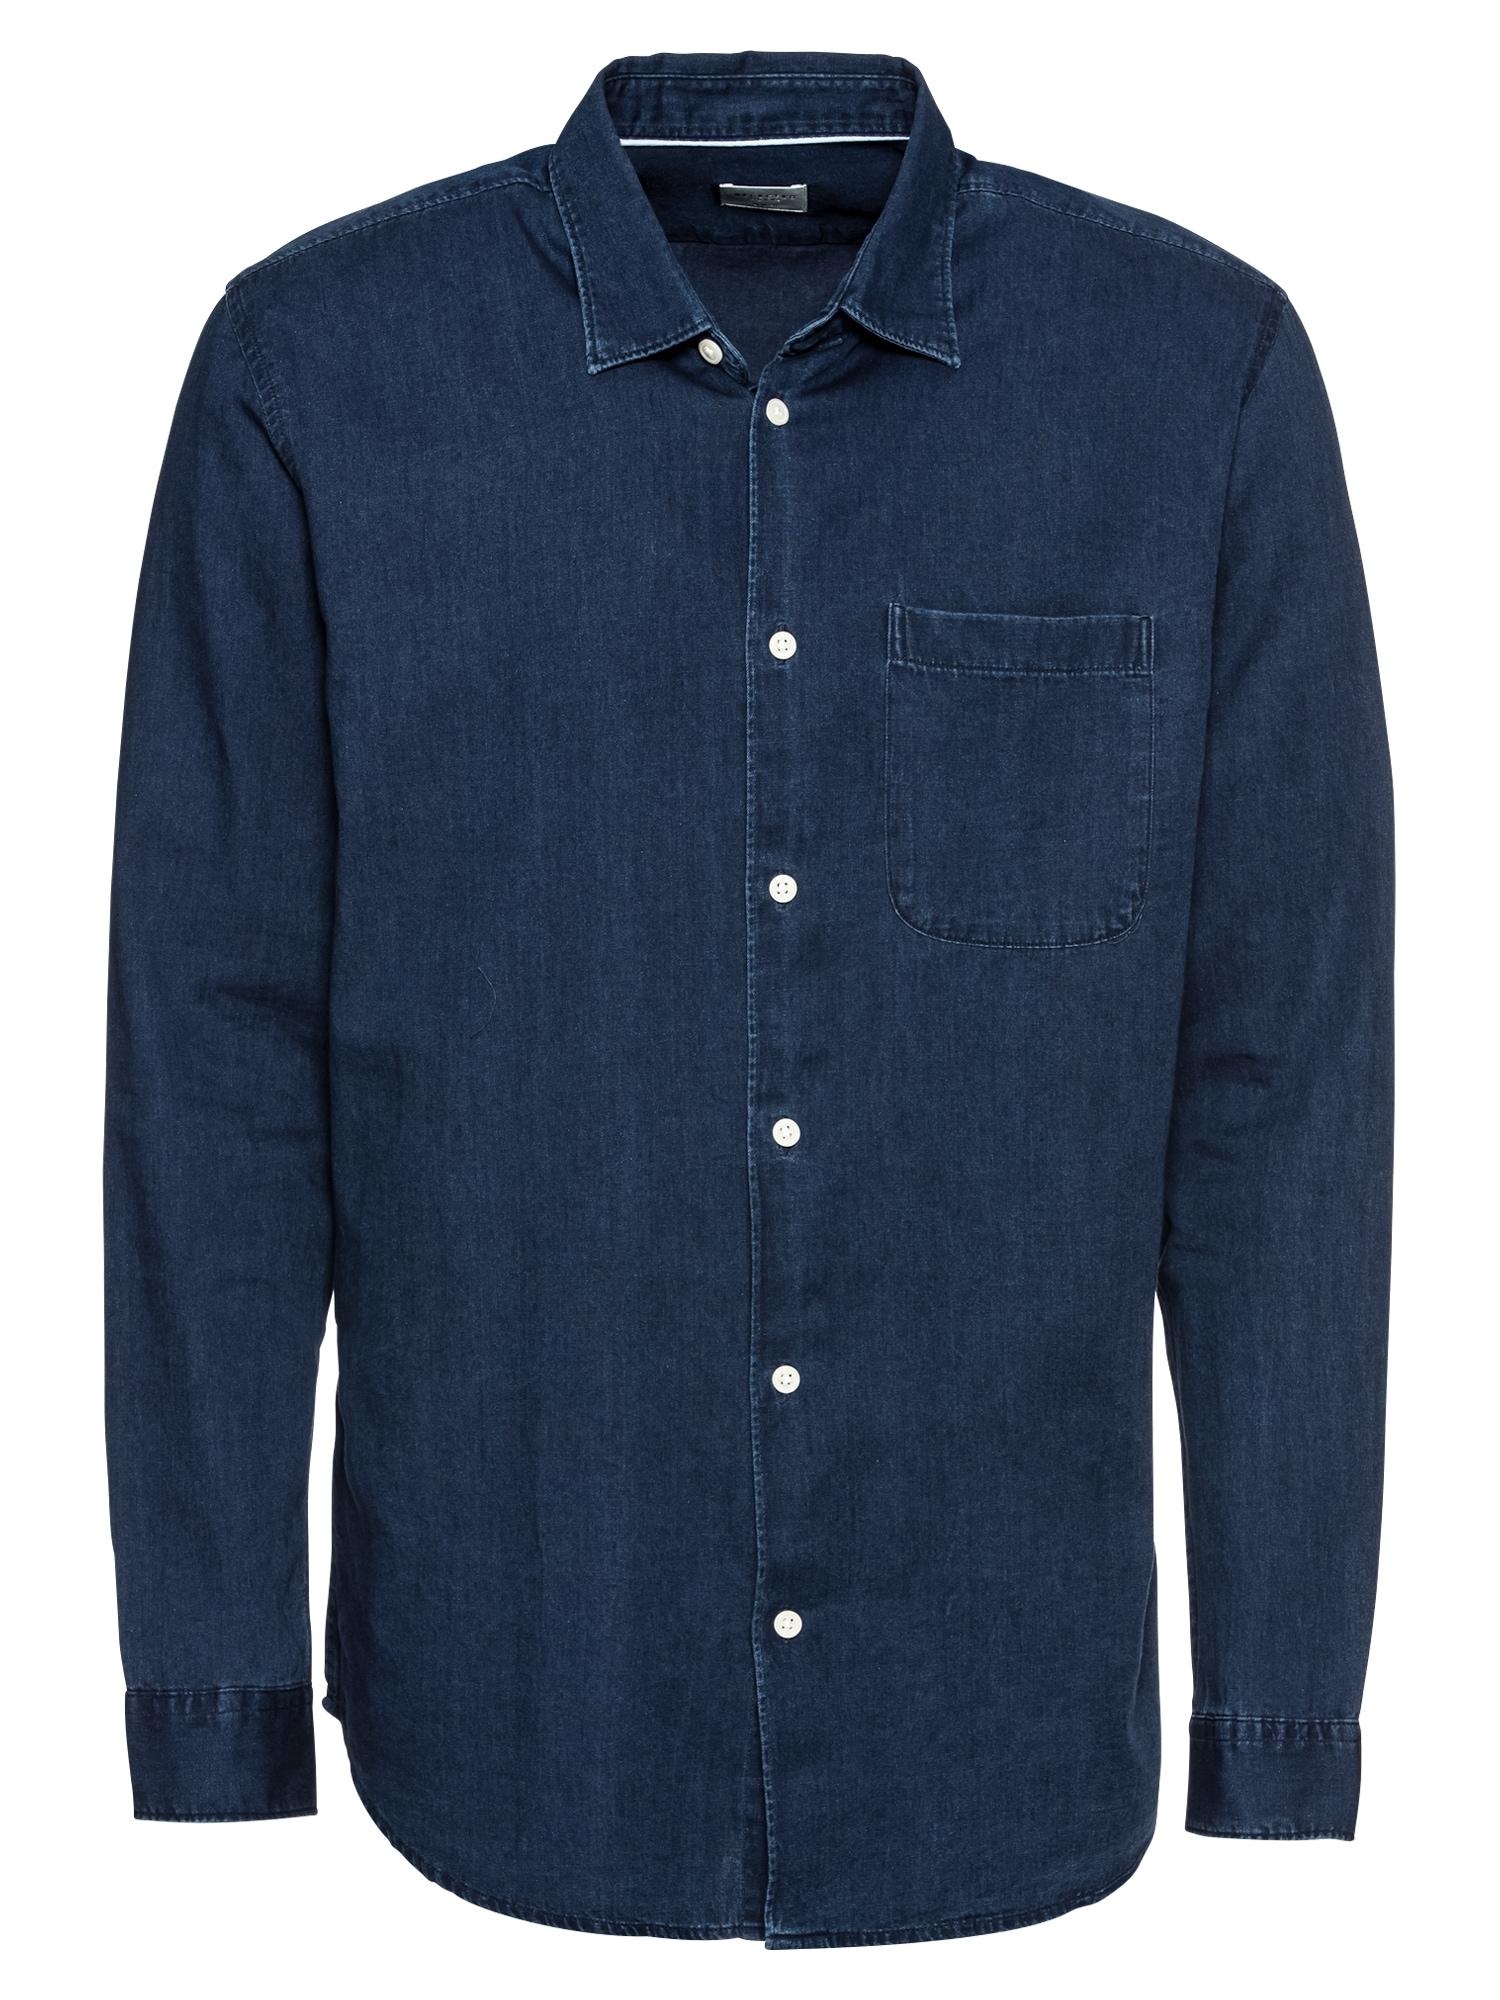 Košile SLHSLIMNOLAN SHIRT LS MIX W modrá džínovina SELECTED HOMME